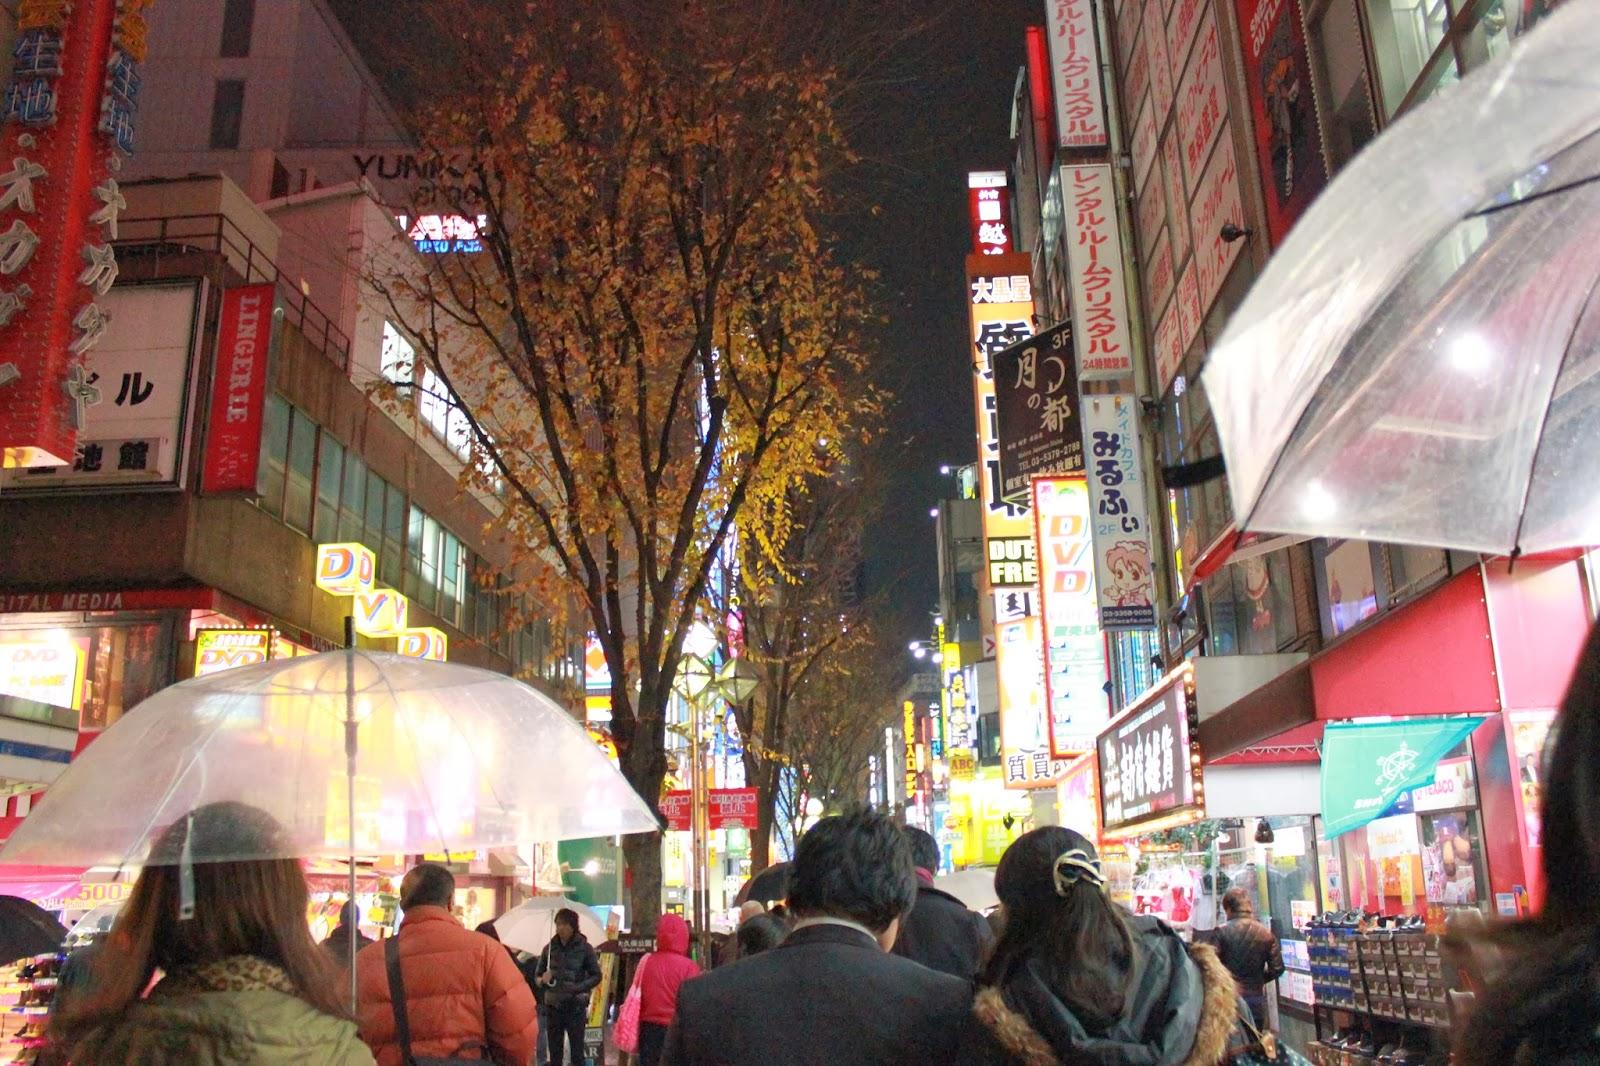 Walking_down_the_streets_of_Shinjuku